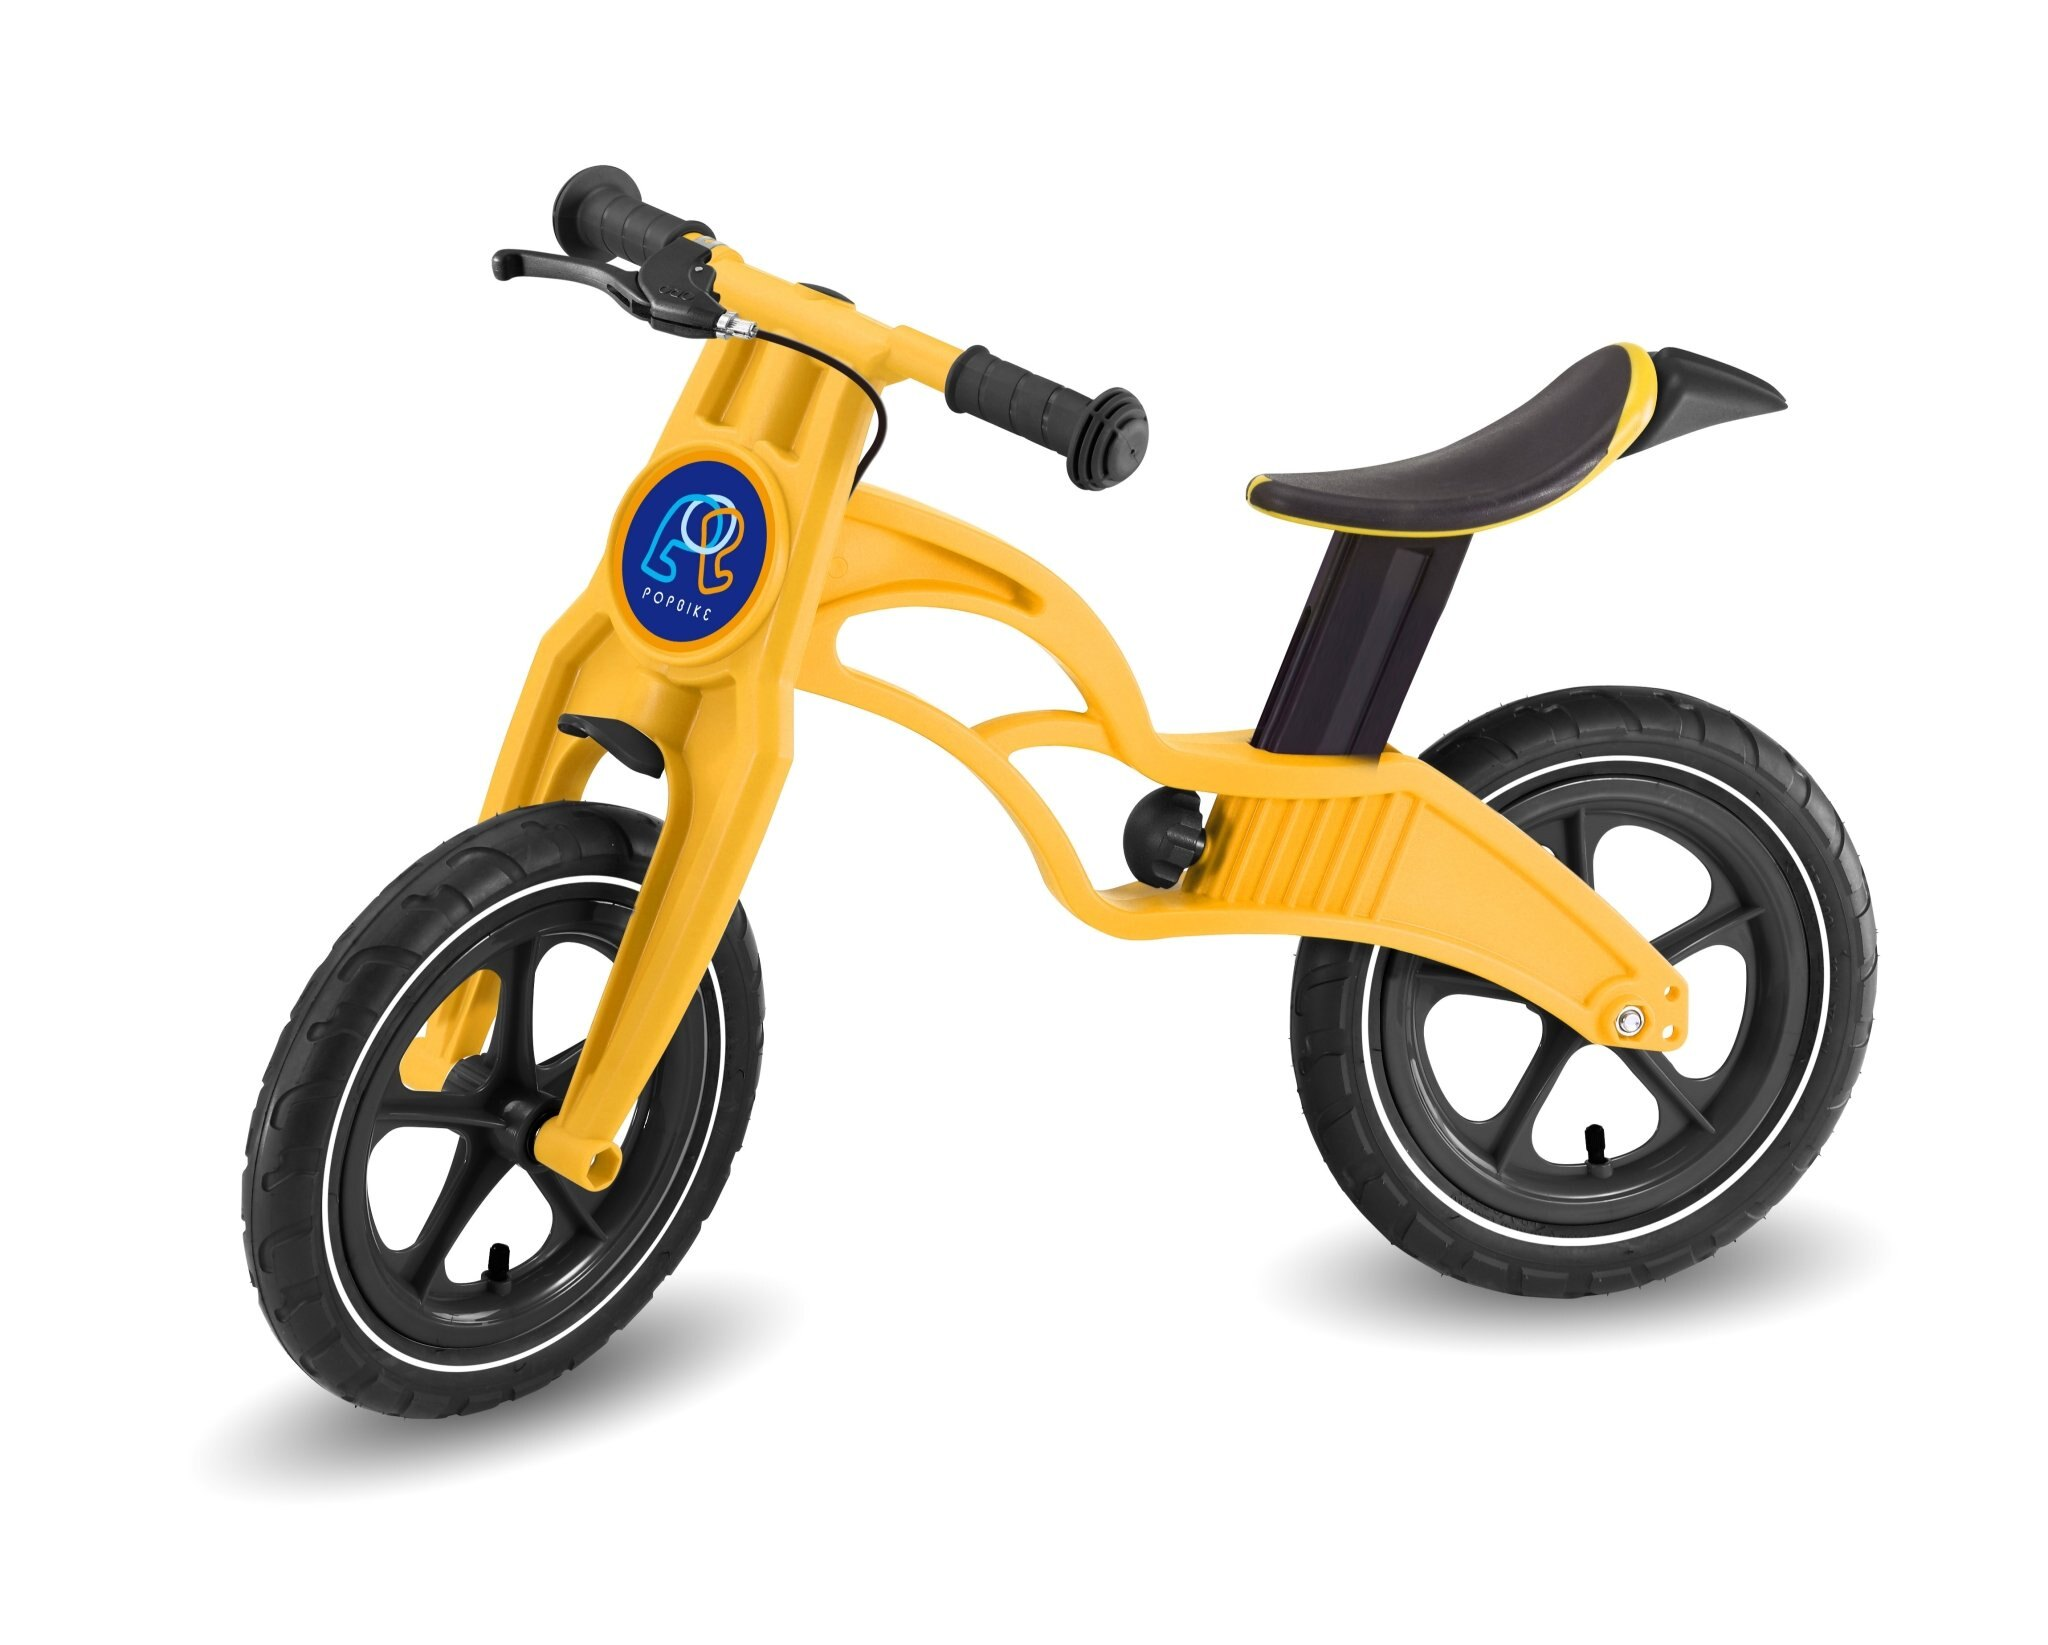 Pop Bike 兒童滑步車 / 平衡車 / 學步車 /  - 煞車版 氣胎 黃色 - 限時優惠好康折扣